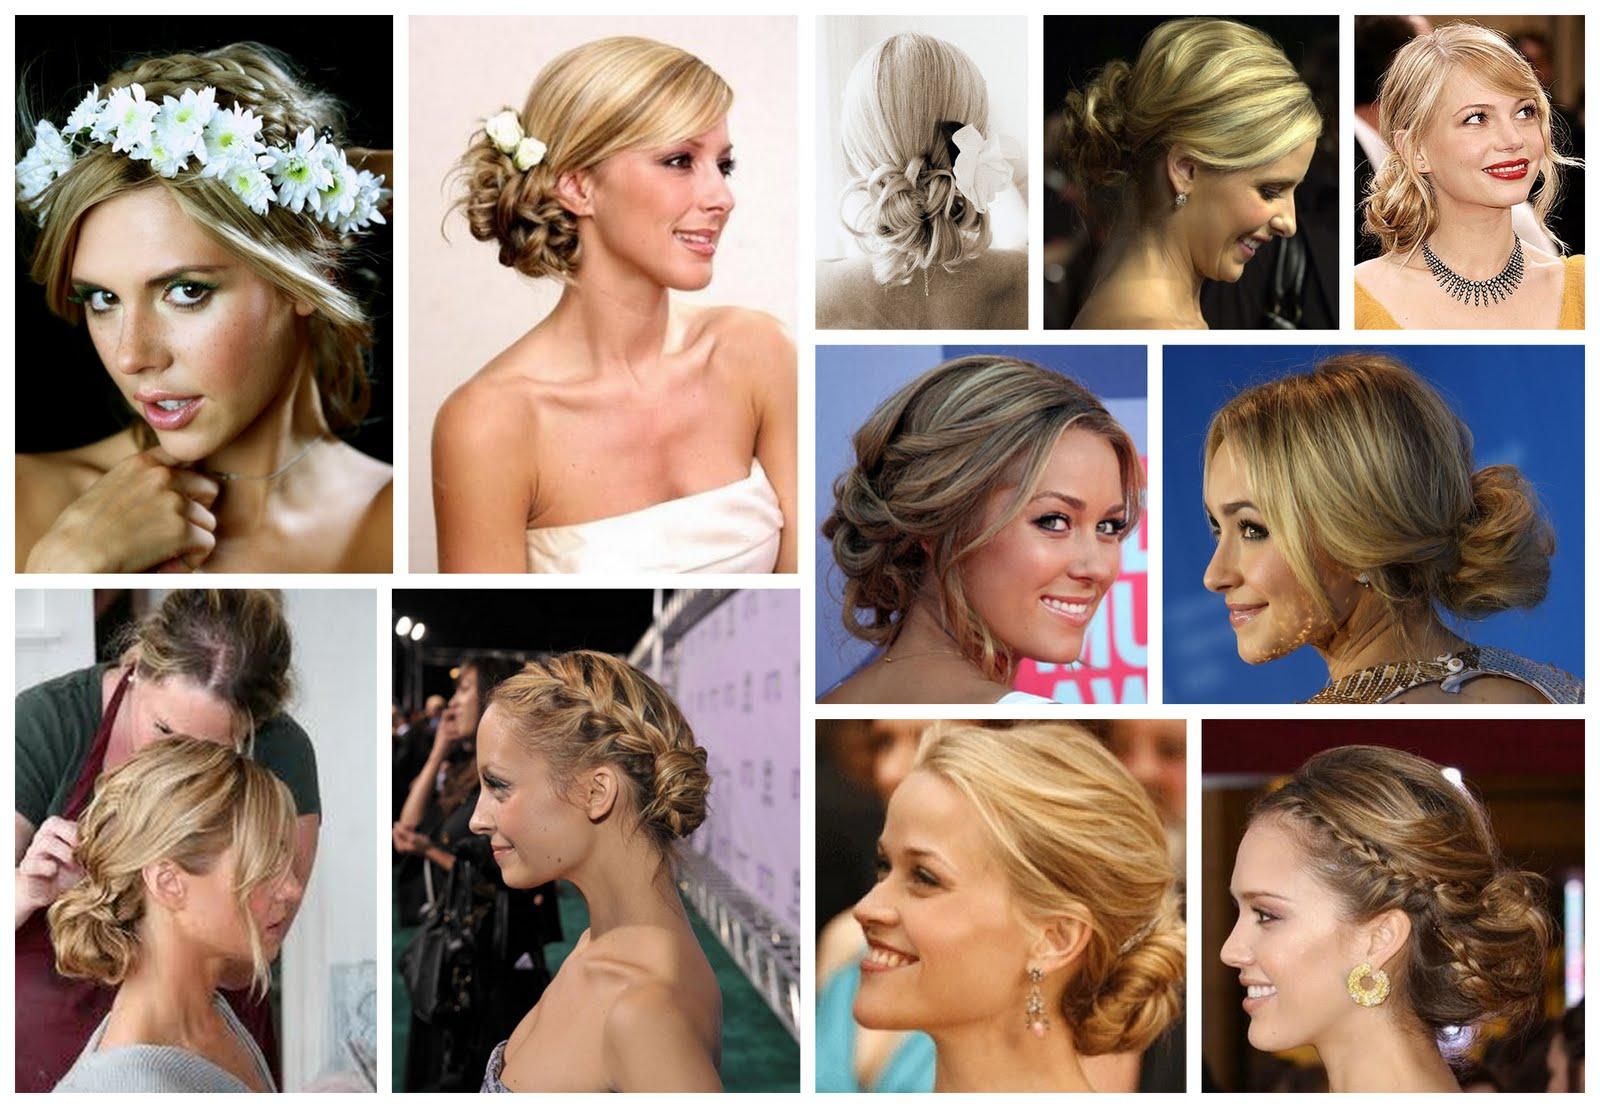 http://1.bp.blogspot.com/-qFxMI0qObm4/TZC56nVllfI/AAAAAAABFLw/LbMPRlfW_W4/s1600/Wedding%2BHair%2BLoose%2BBun%2BBefore%2Bthe%2BBig%2BDay%2BWedding%2BBlog%2BUK%2B2.jpg